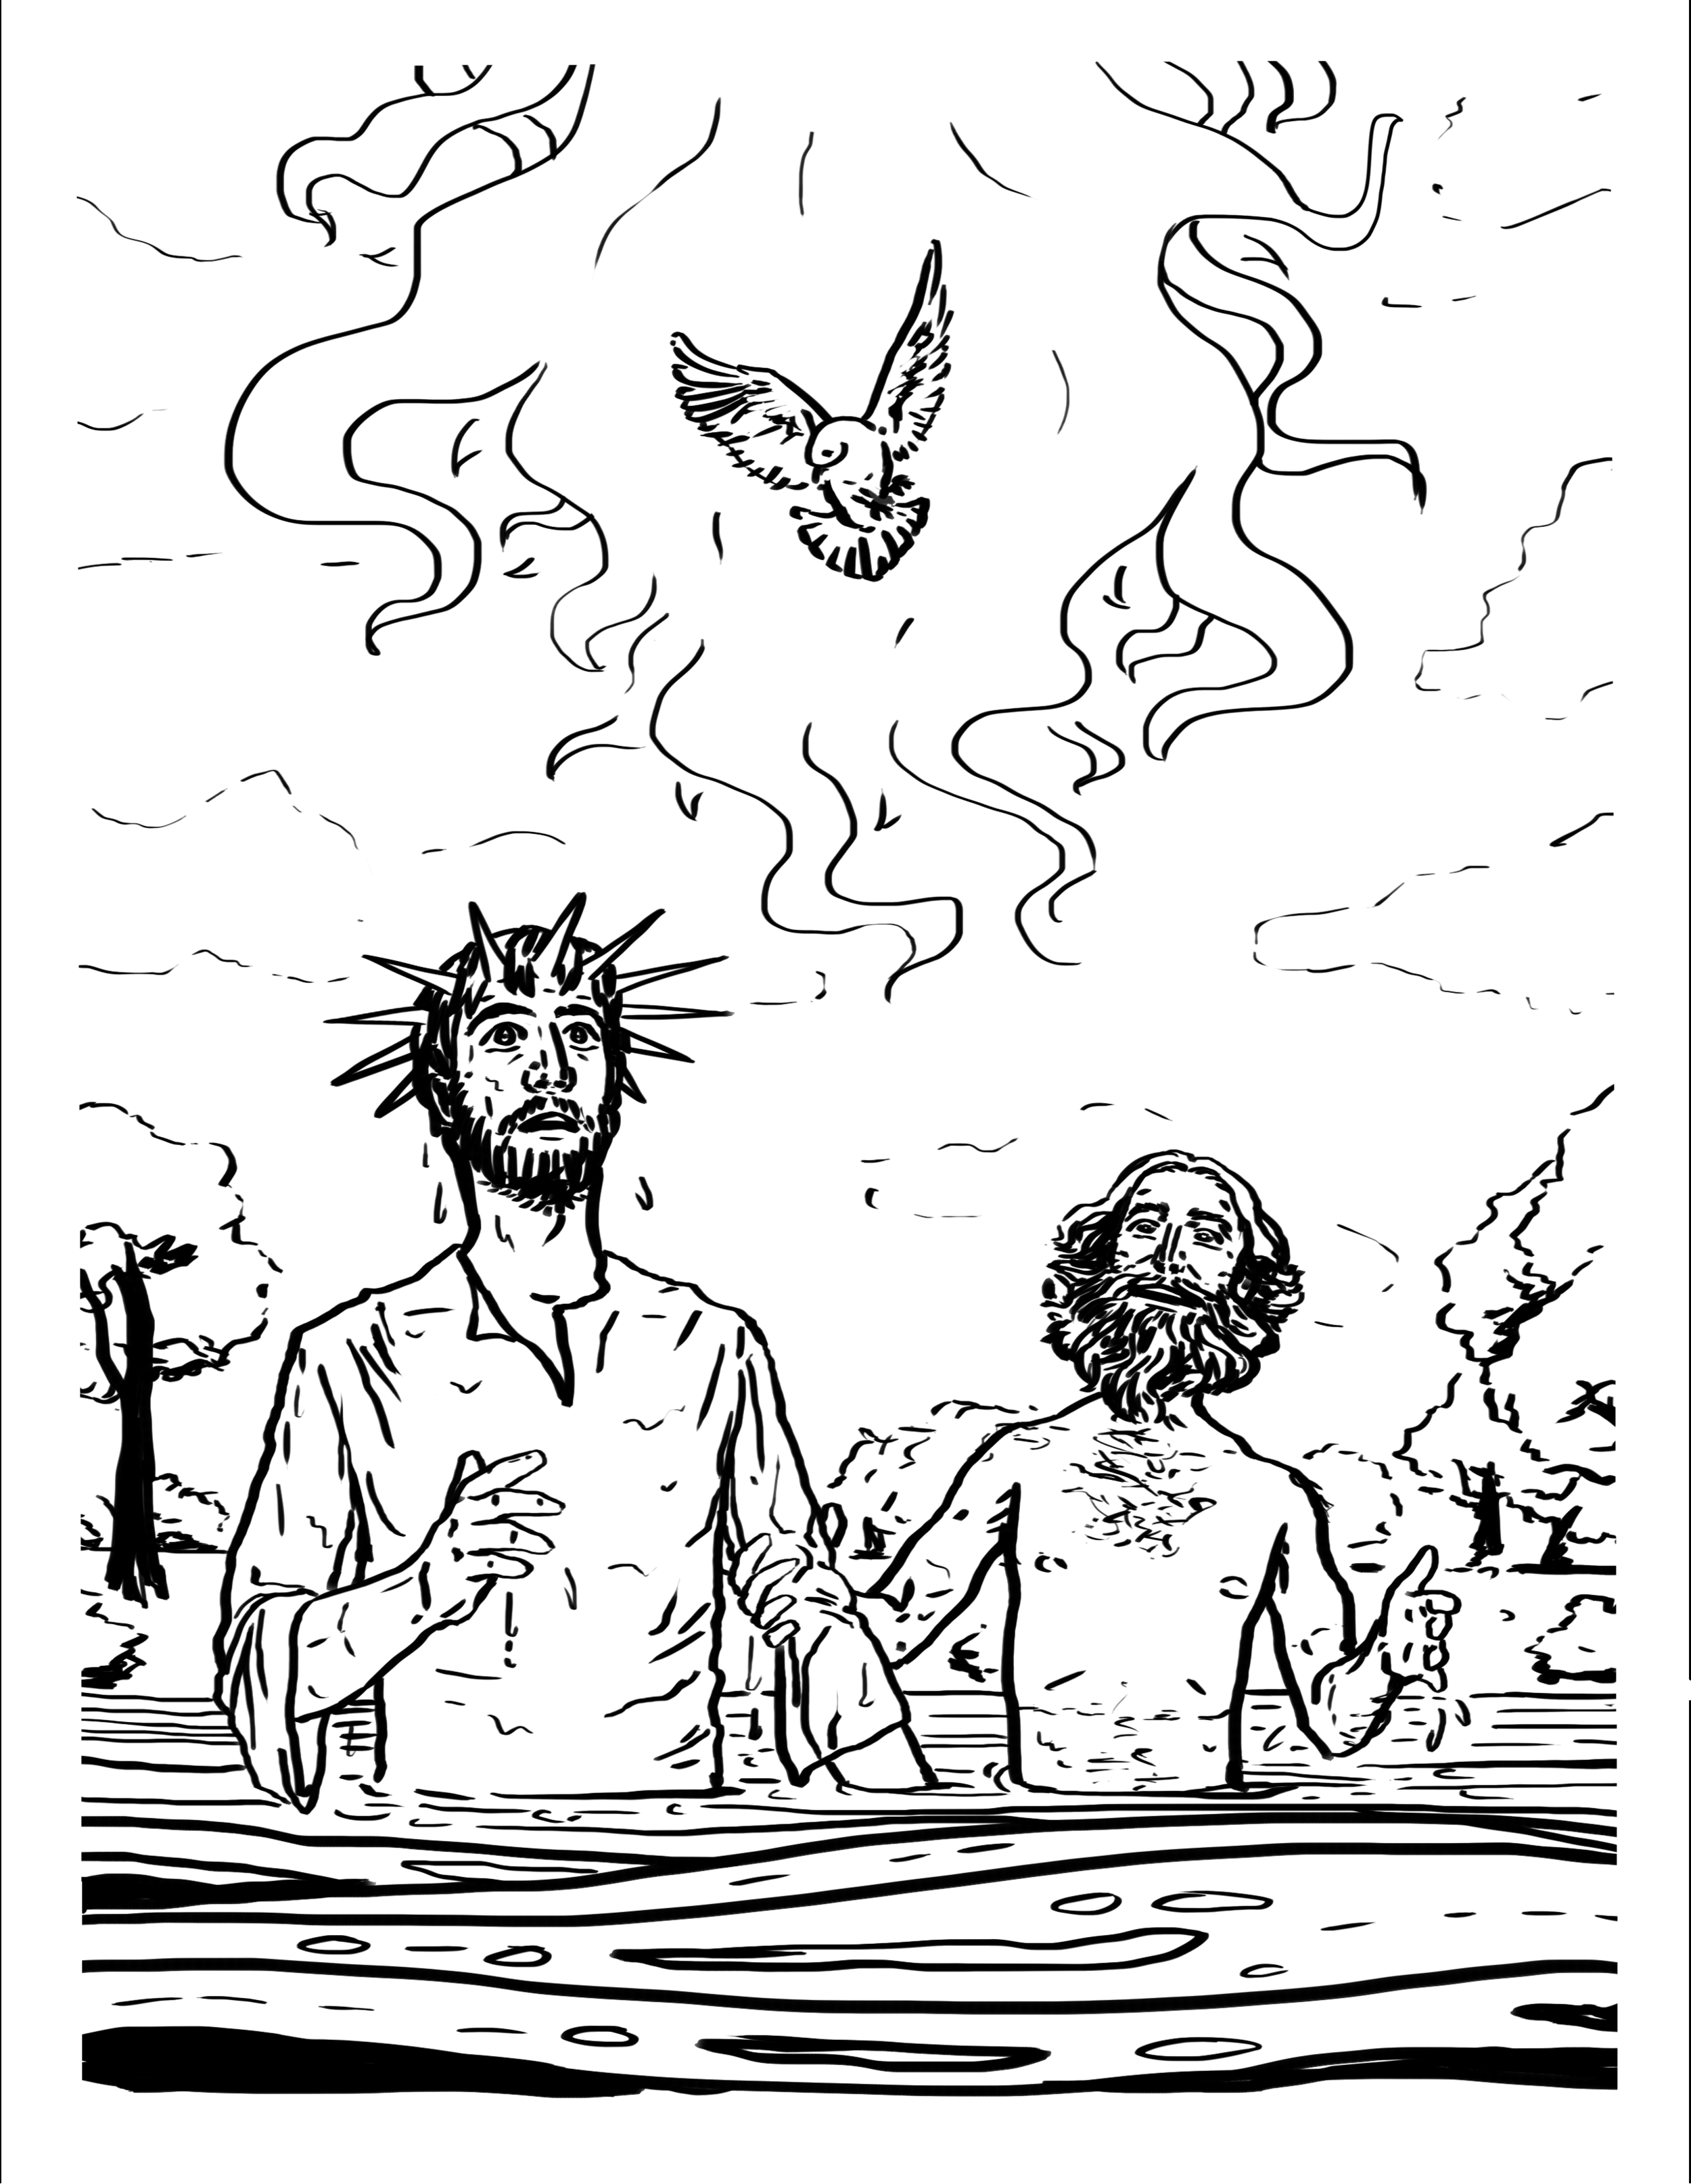 Lent-Illustrations-ColoringArtboard-3.png